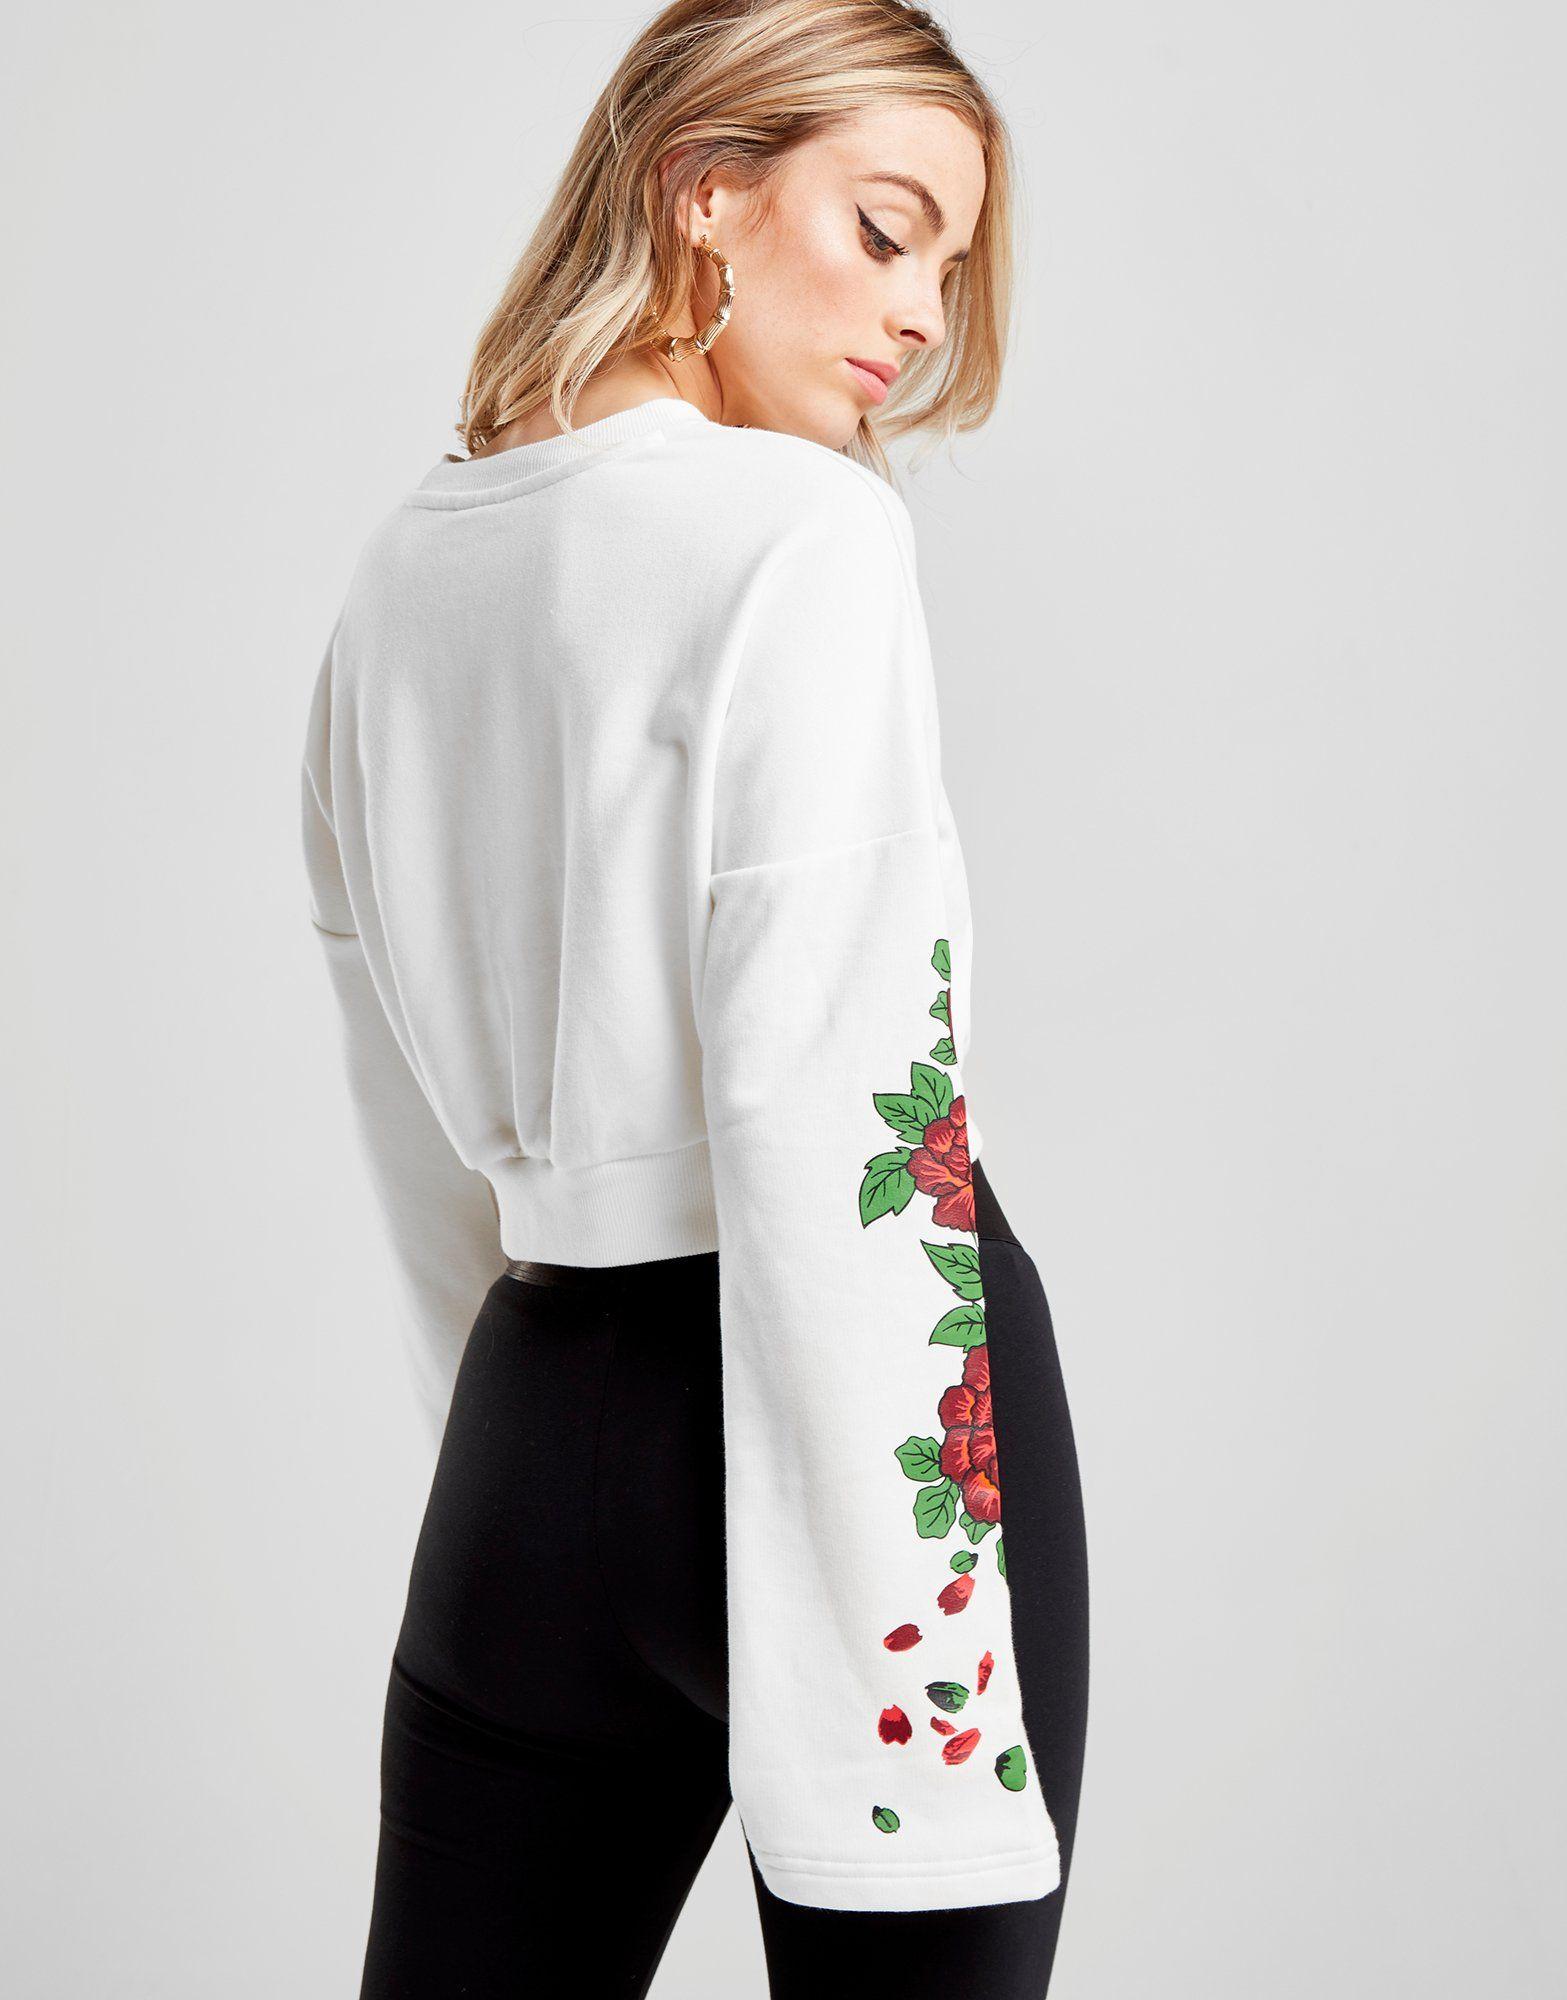 PUMA Sweat Gothic Floral Crop Femme